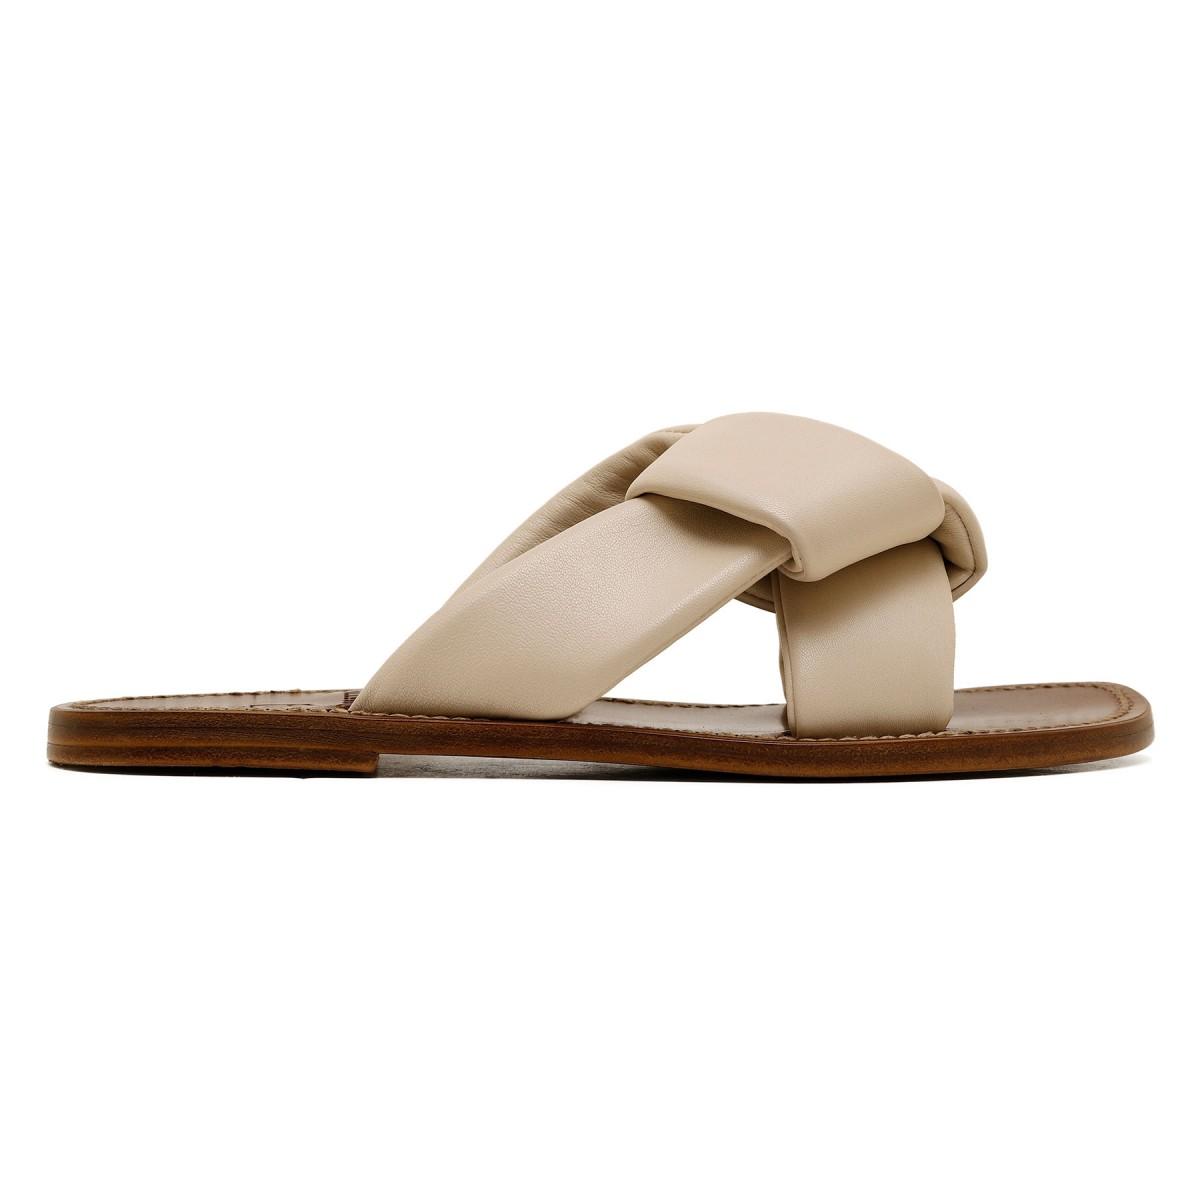 Cream leather slide sandals